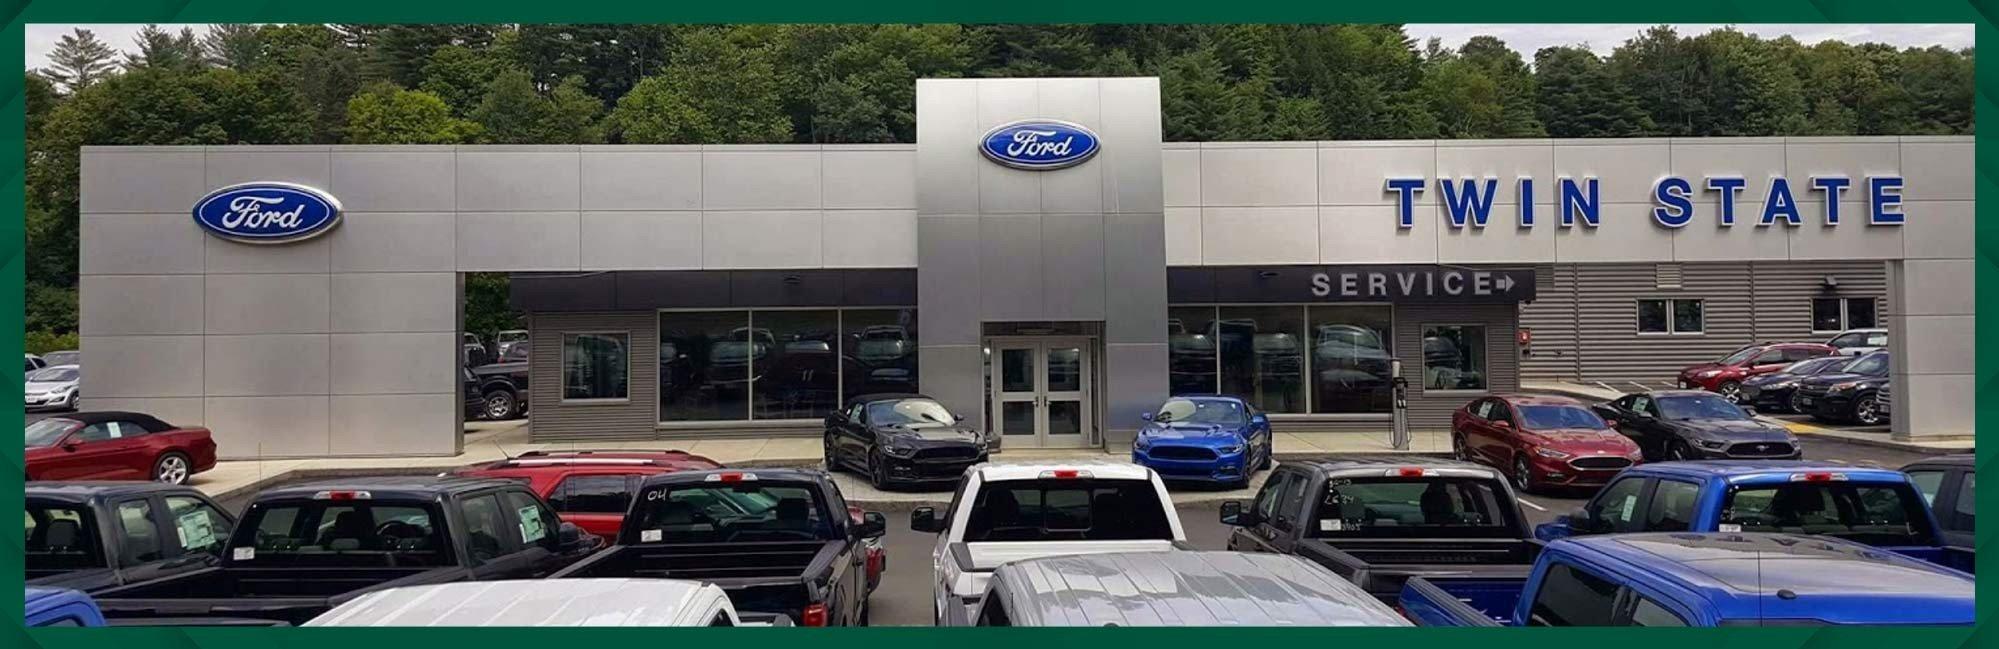 Ford dealership near Littleton, NH